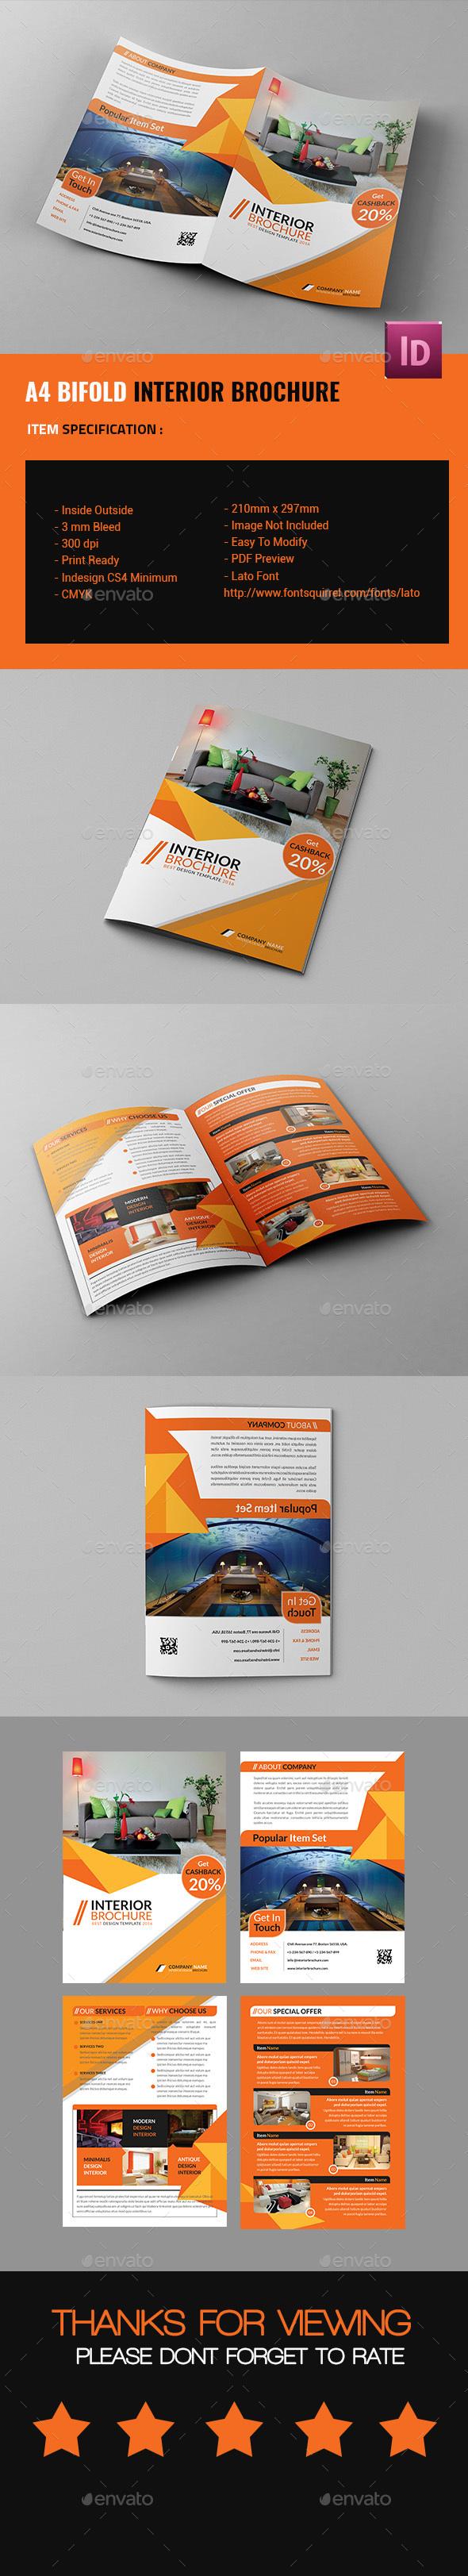 A4 Bifold Interior Design Brochure - Corporate Brochures